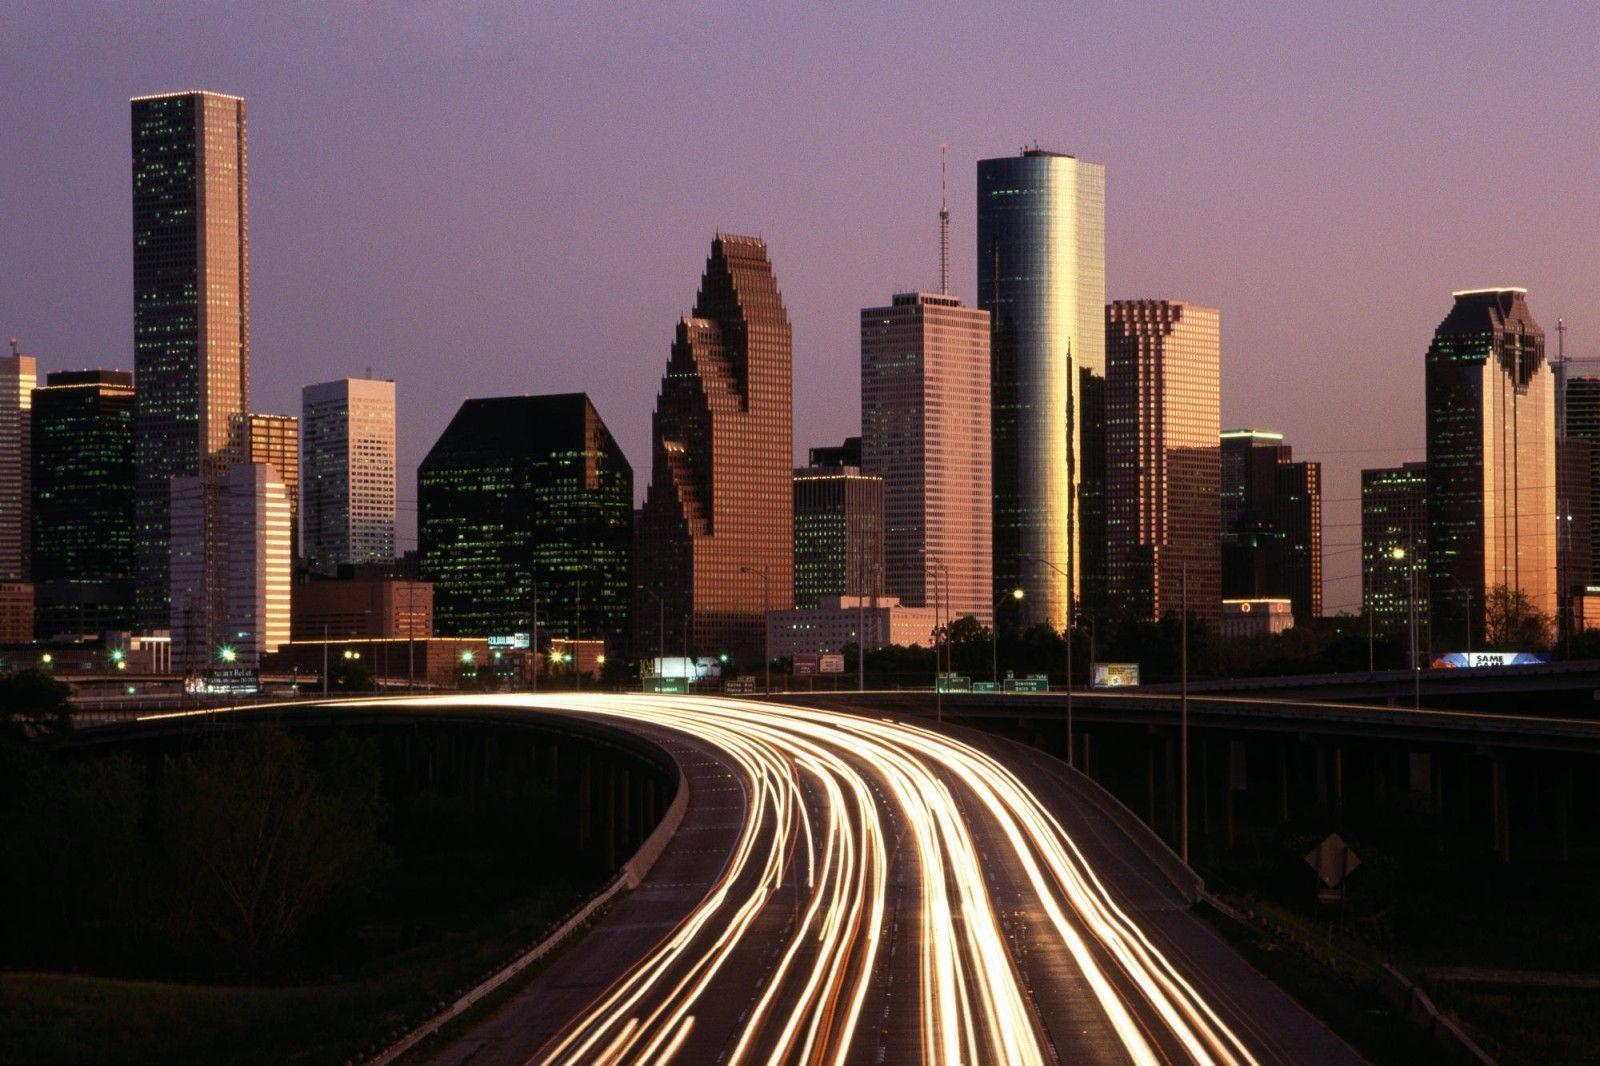 Houston skyline at night hd www galleryhip com the hippest pics